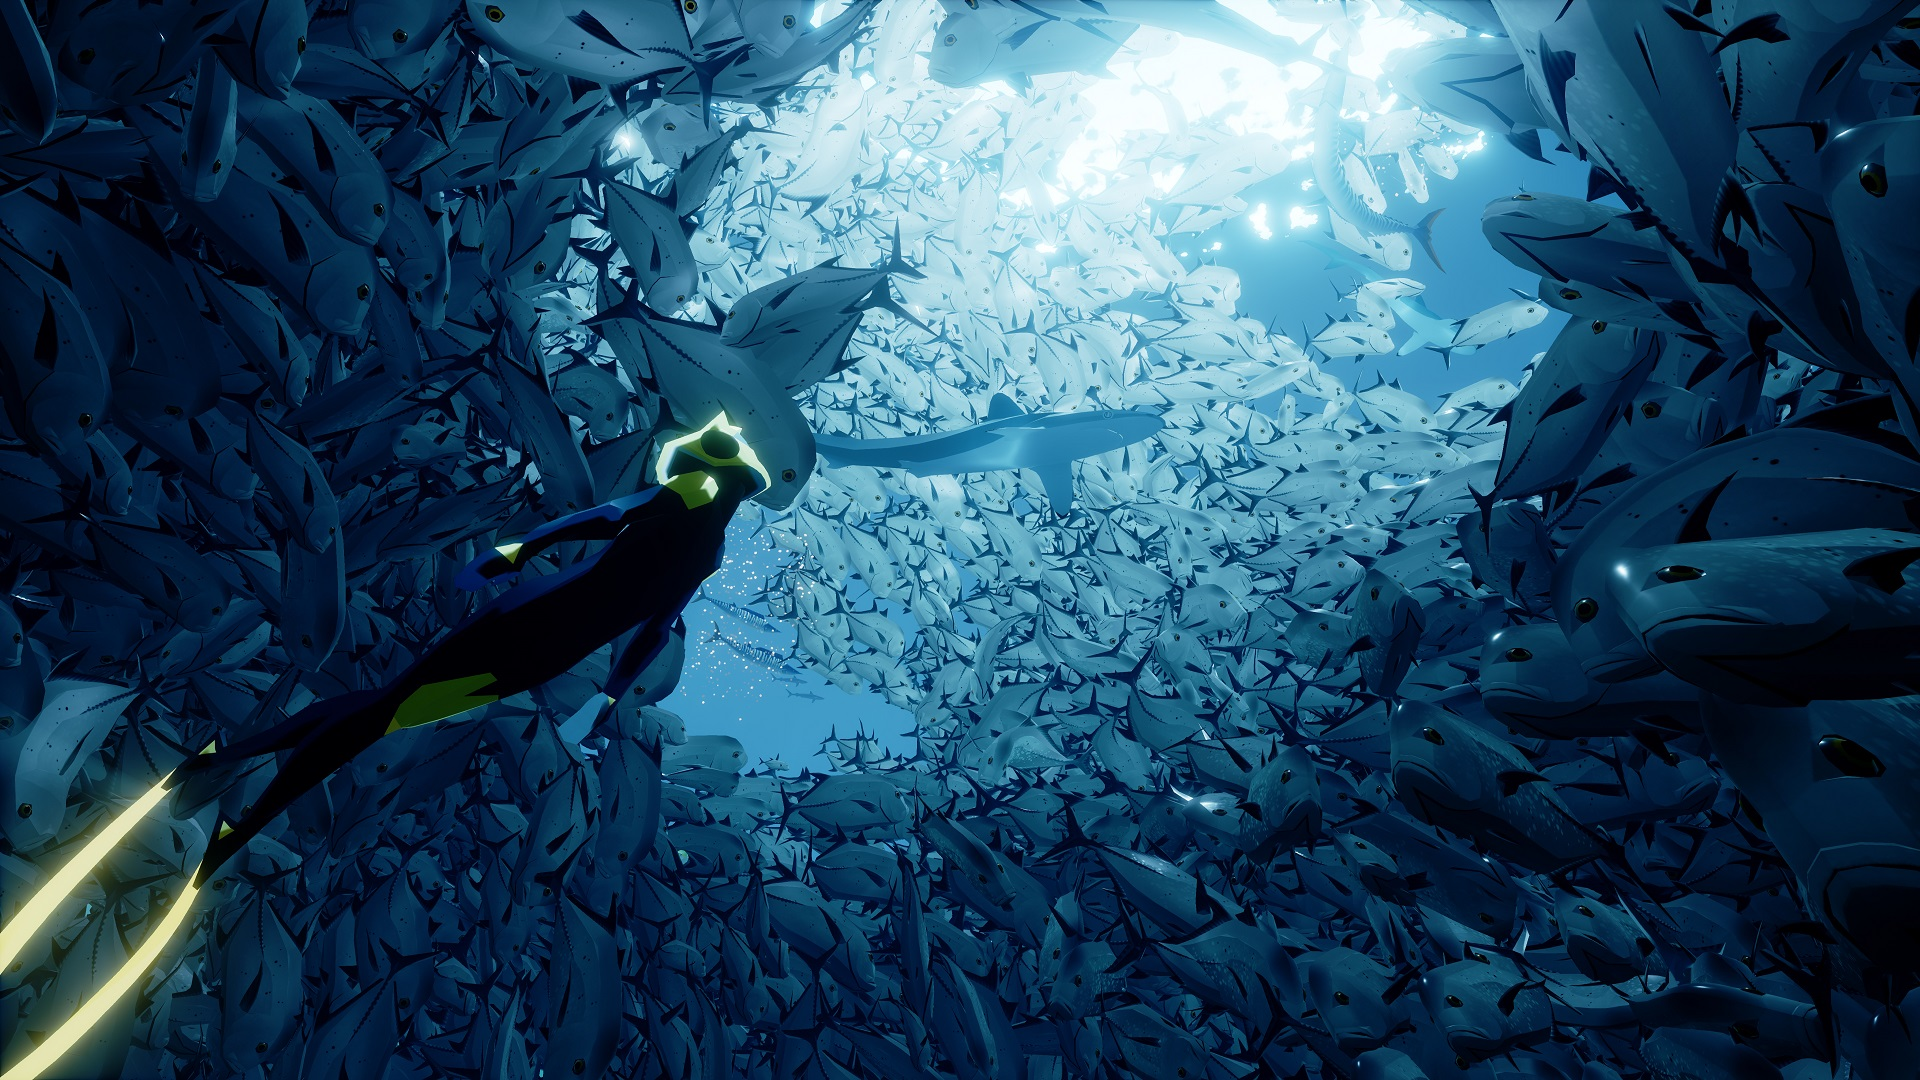 Splishy splash, this week's Epic freebies have an ocean and a storm screenshot